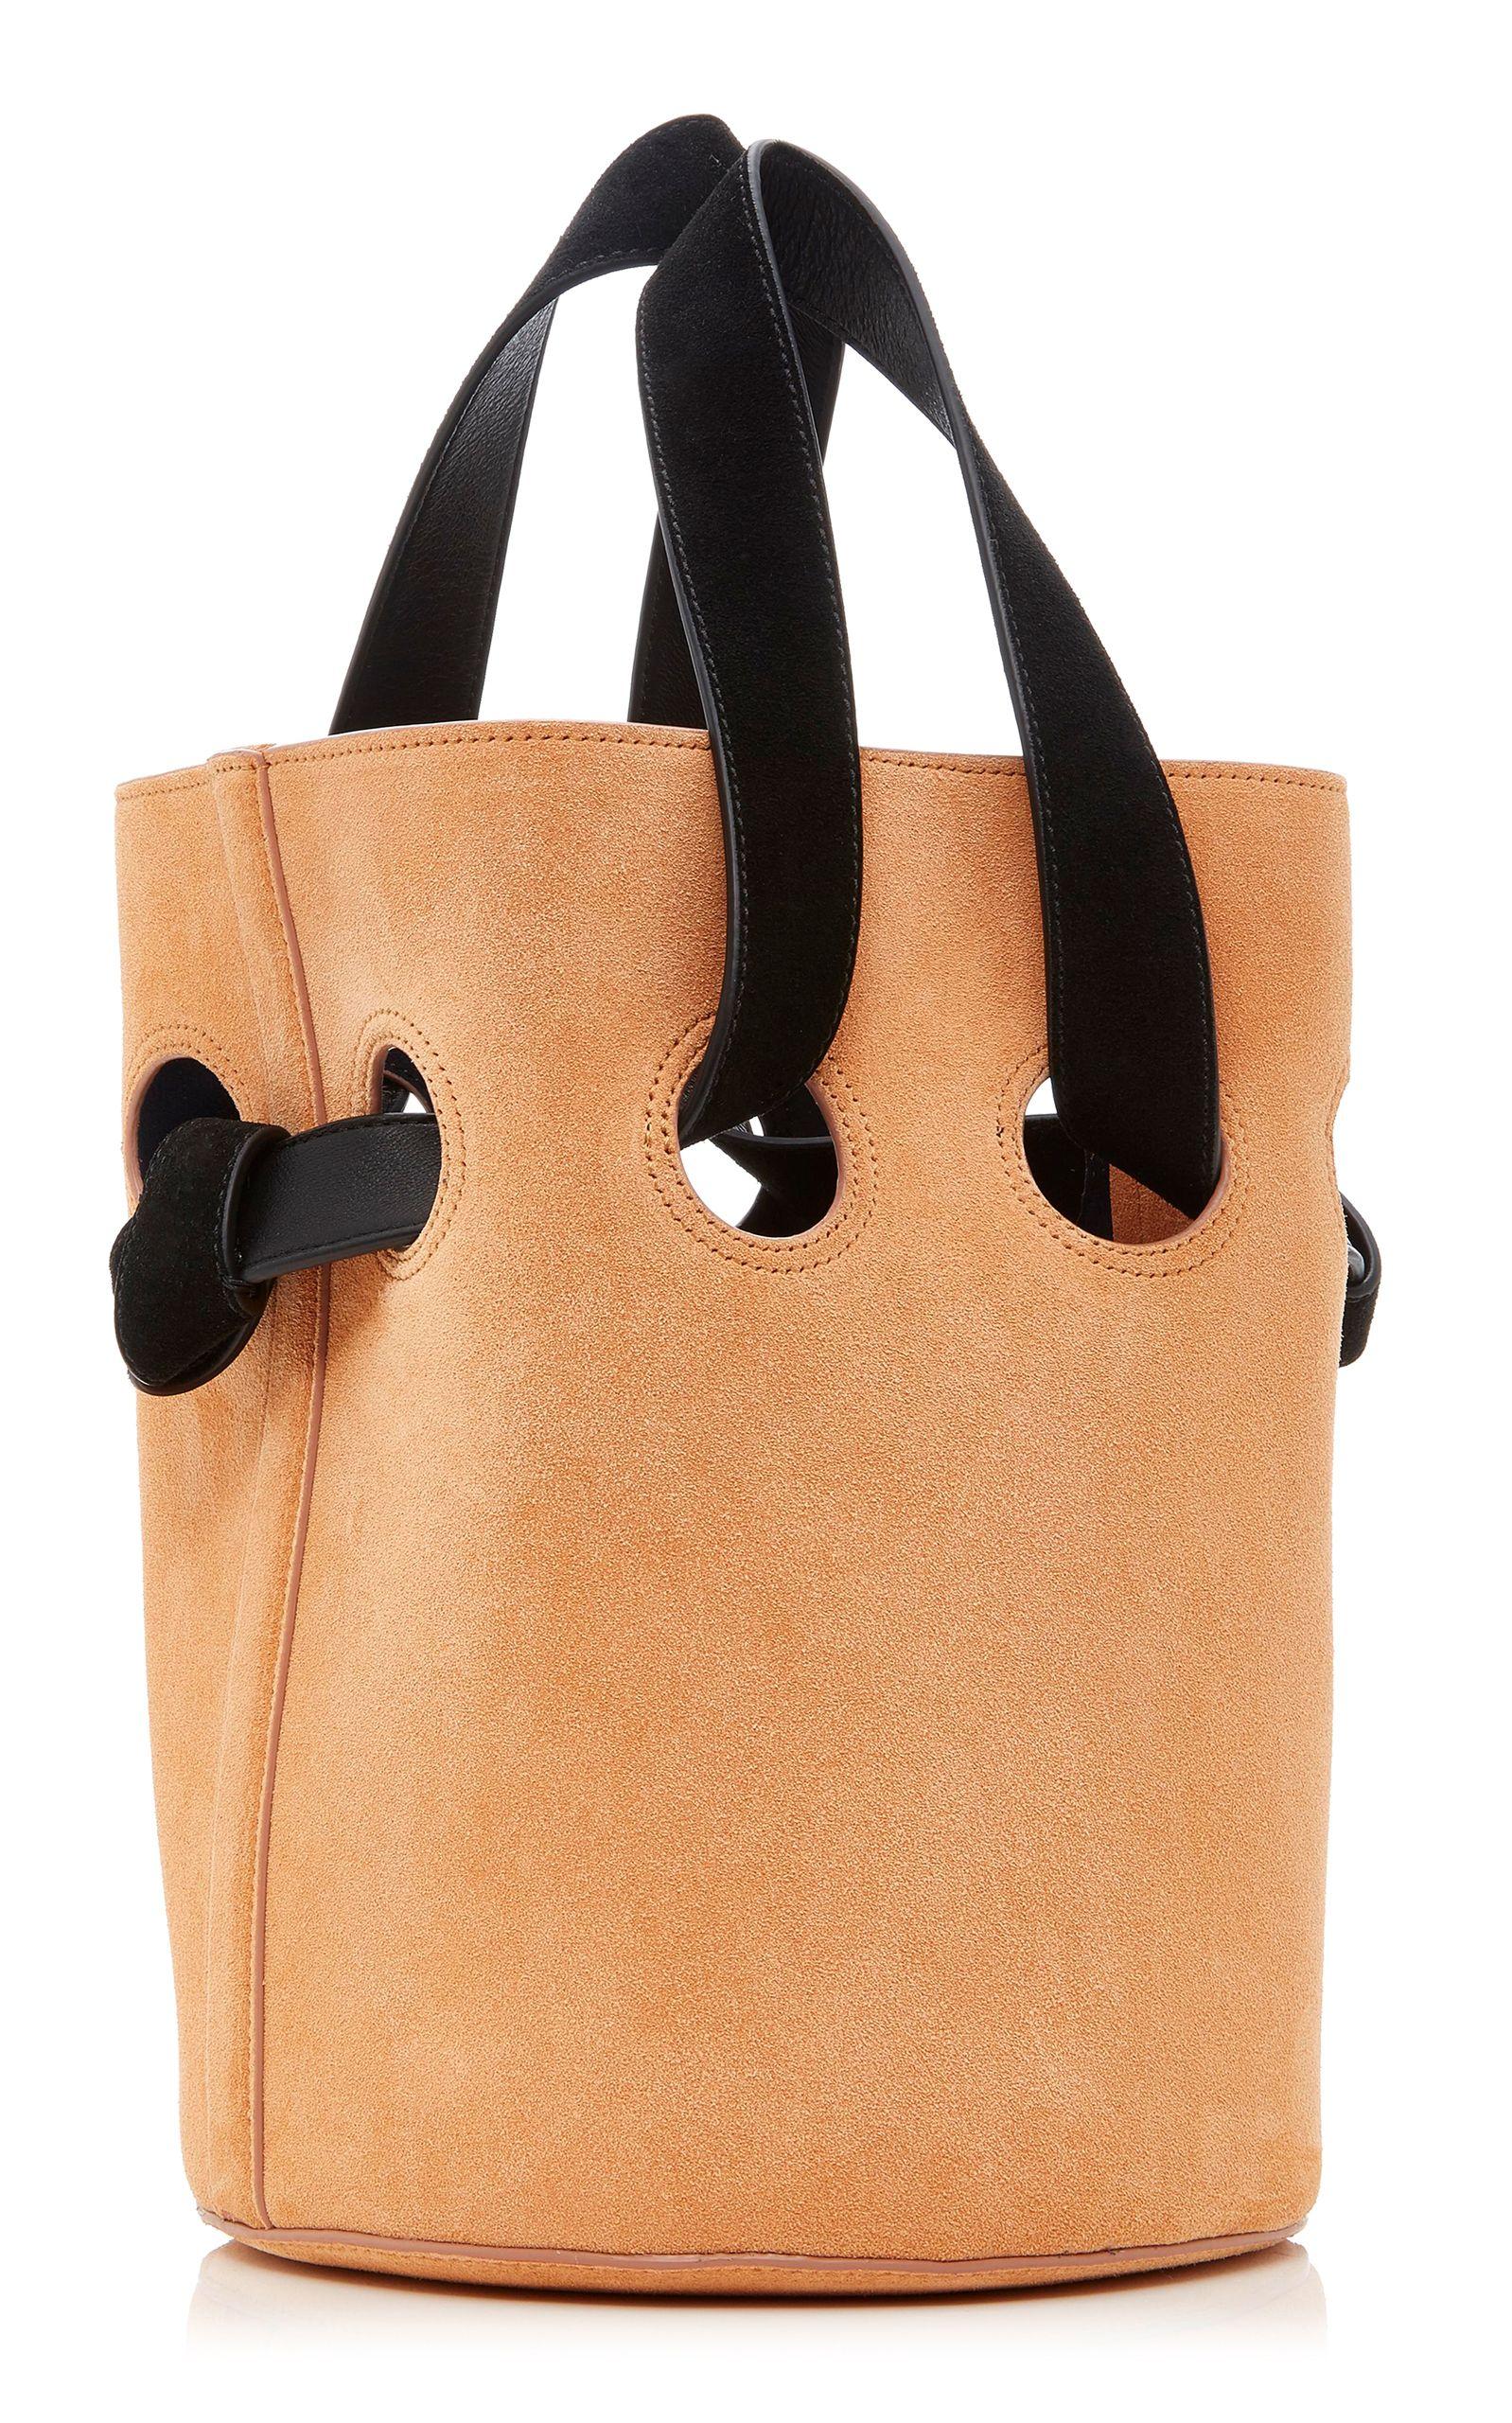 Trademark goodall suede bucket bag lthingsvogue